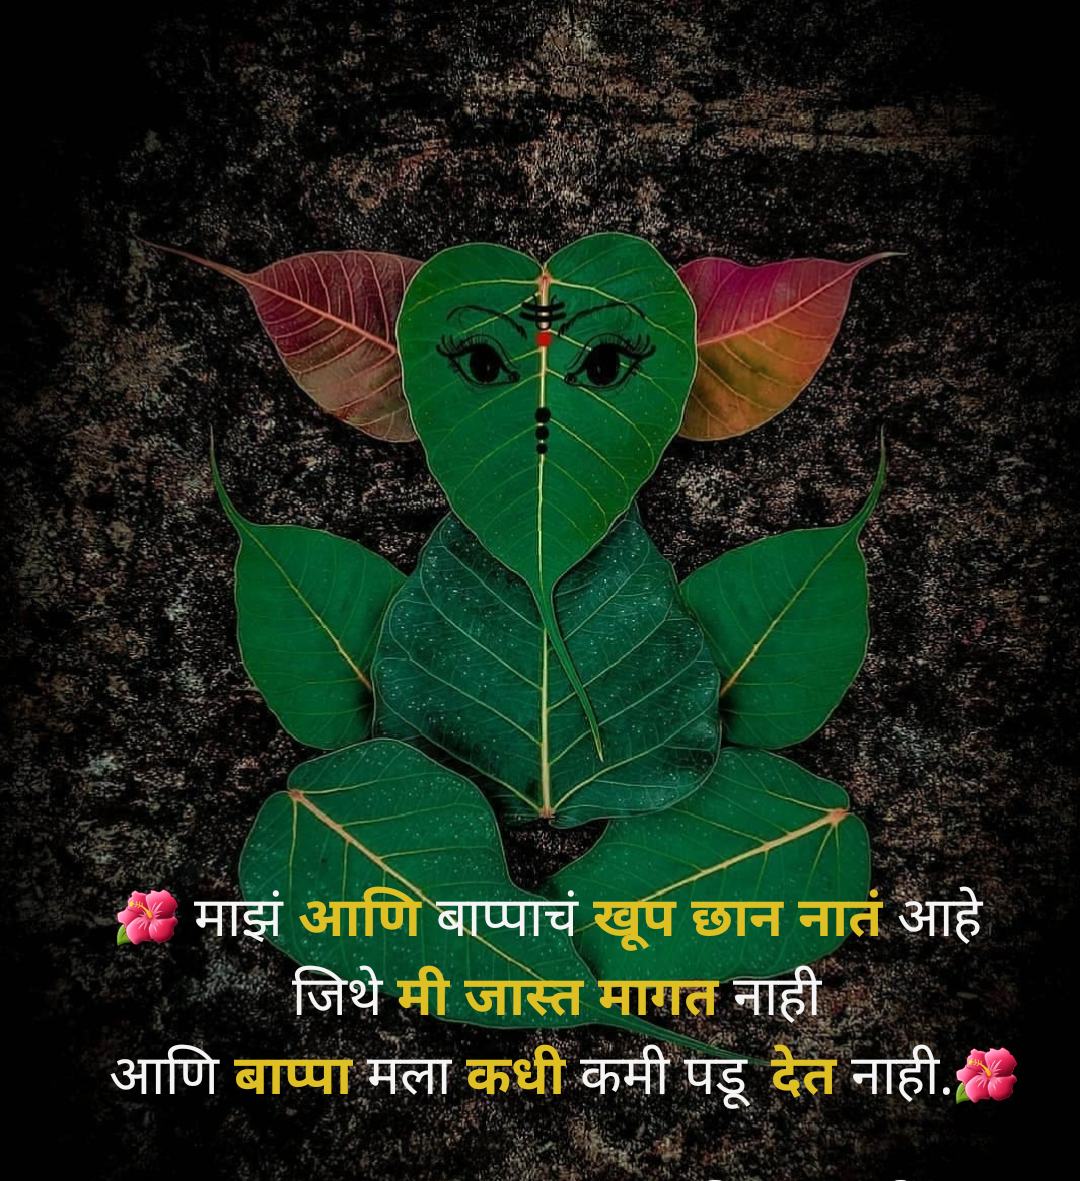 Ganpati Status In Marathi Language, Ganpati Bappa Status In Marathi, गणेश चतुर्थी सुविचार